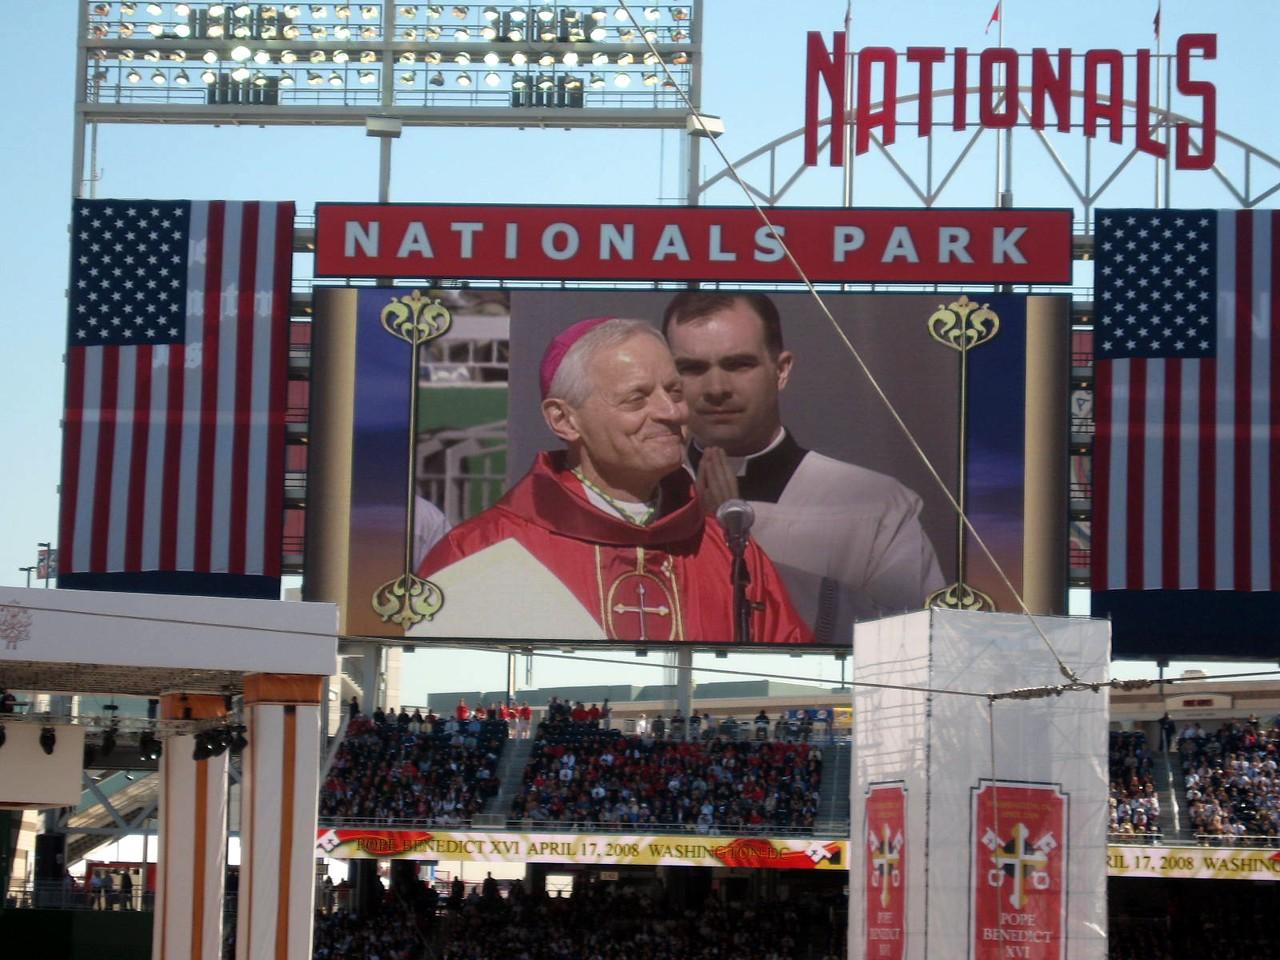 Archbishop of Washington Donald W. Wuerl welcomes Pope Benedict XVI